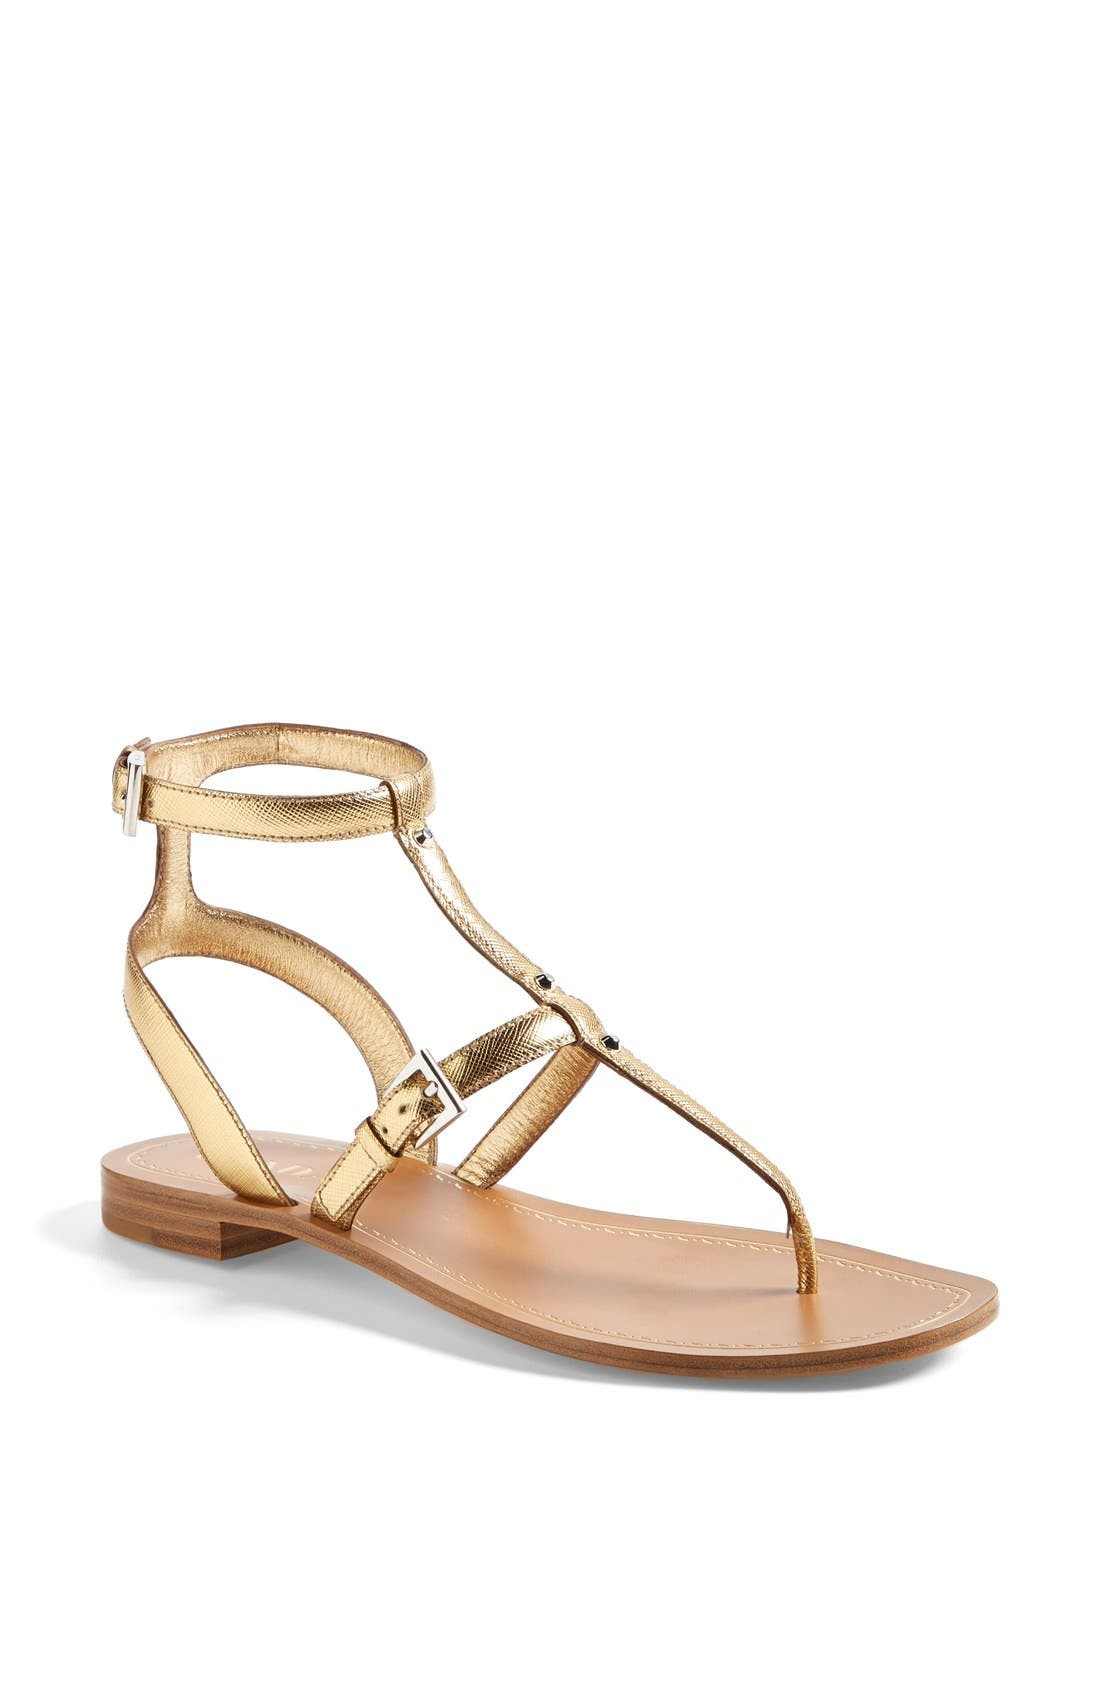 Main Image - Prada Gladiator Sandal